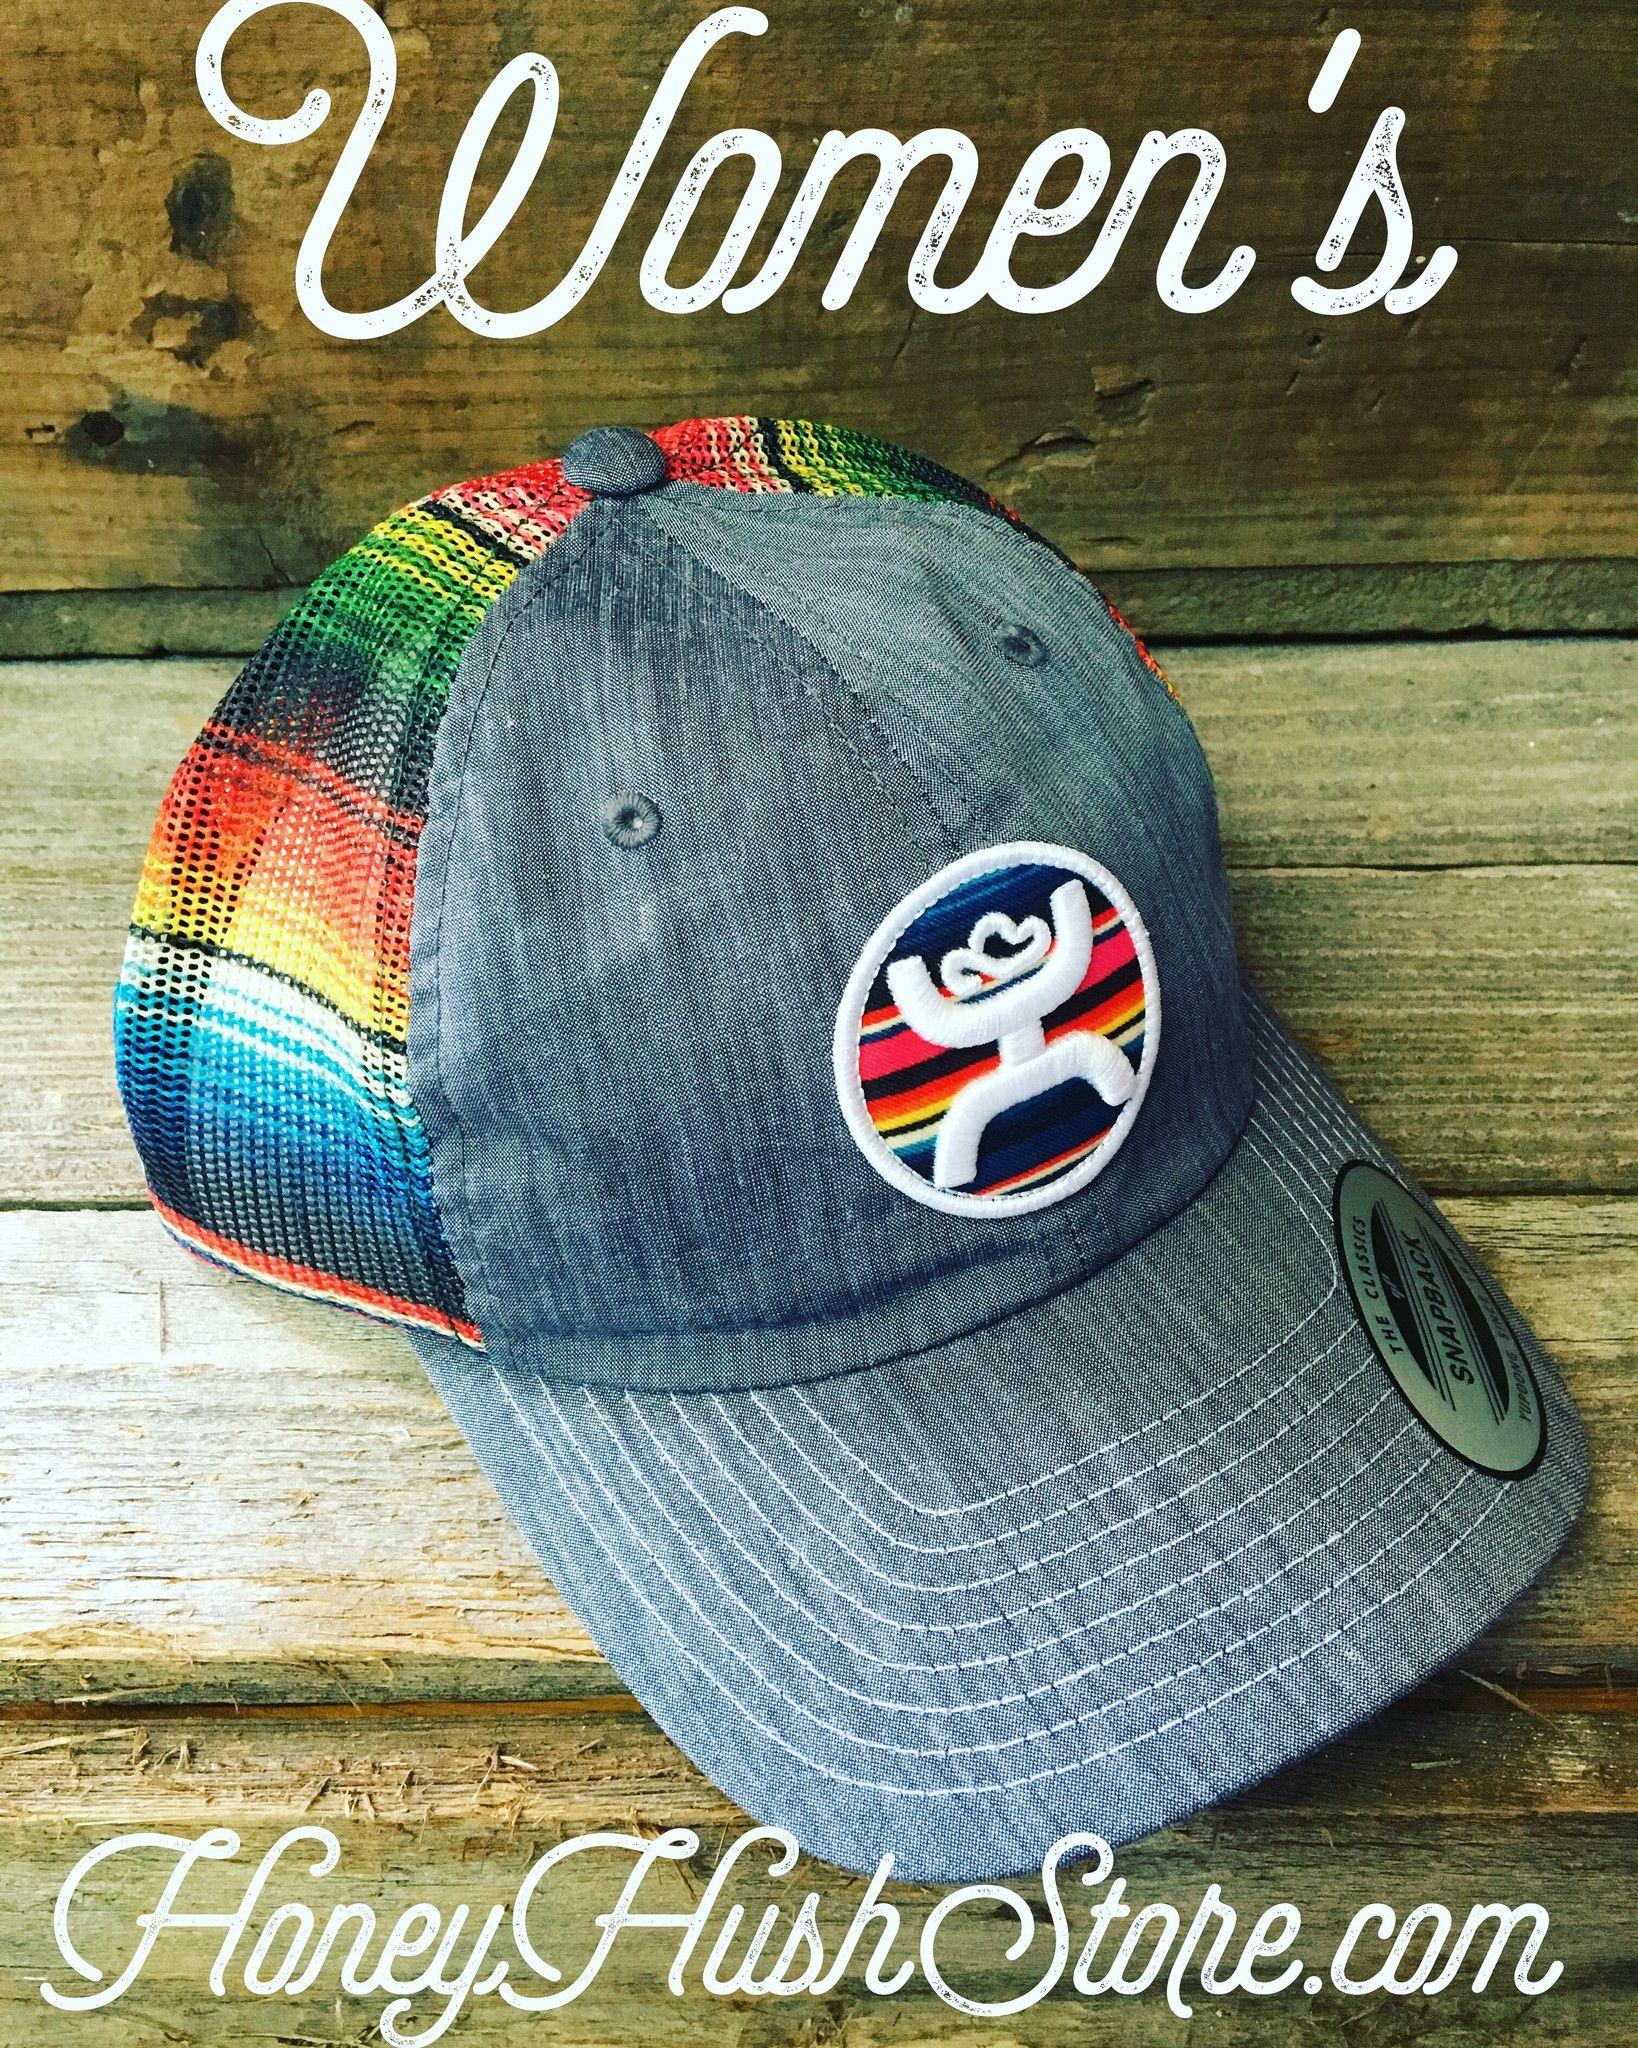 Serape colors in this beautiful Hooey cap for women.  7821fde71c5e